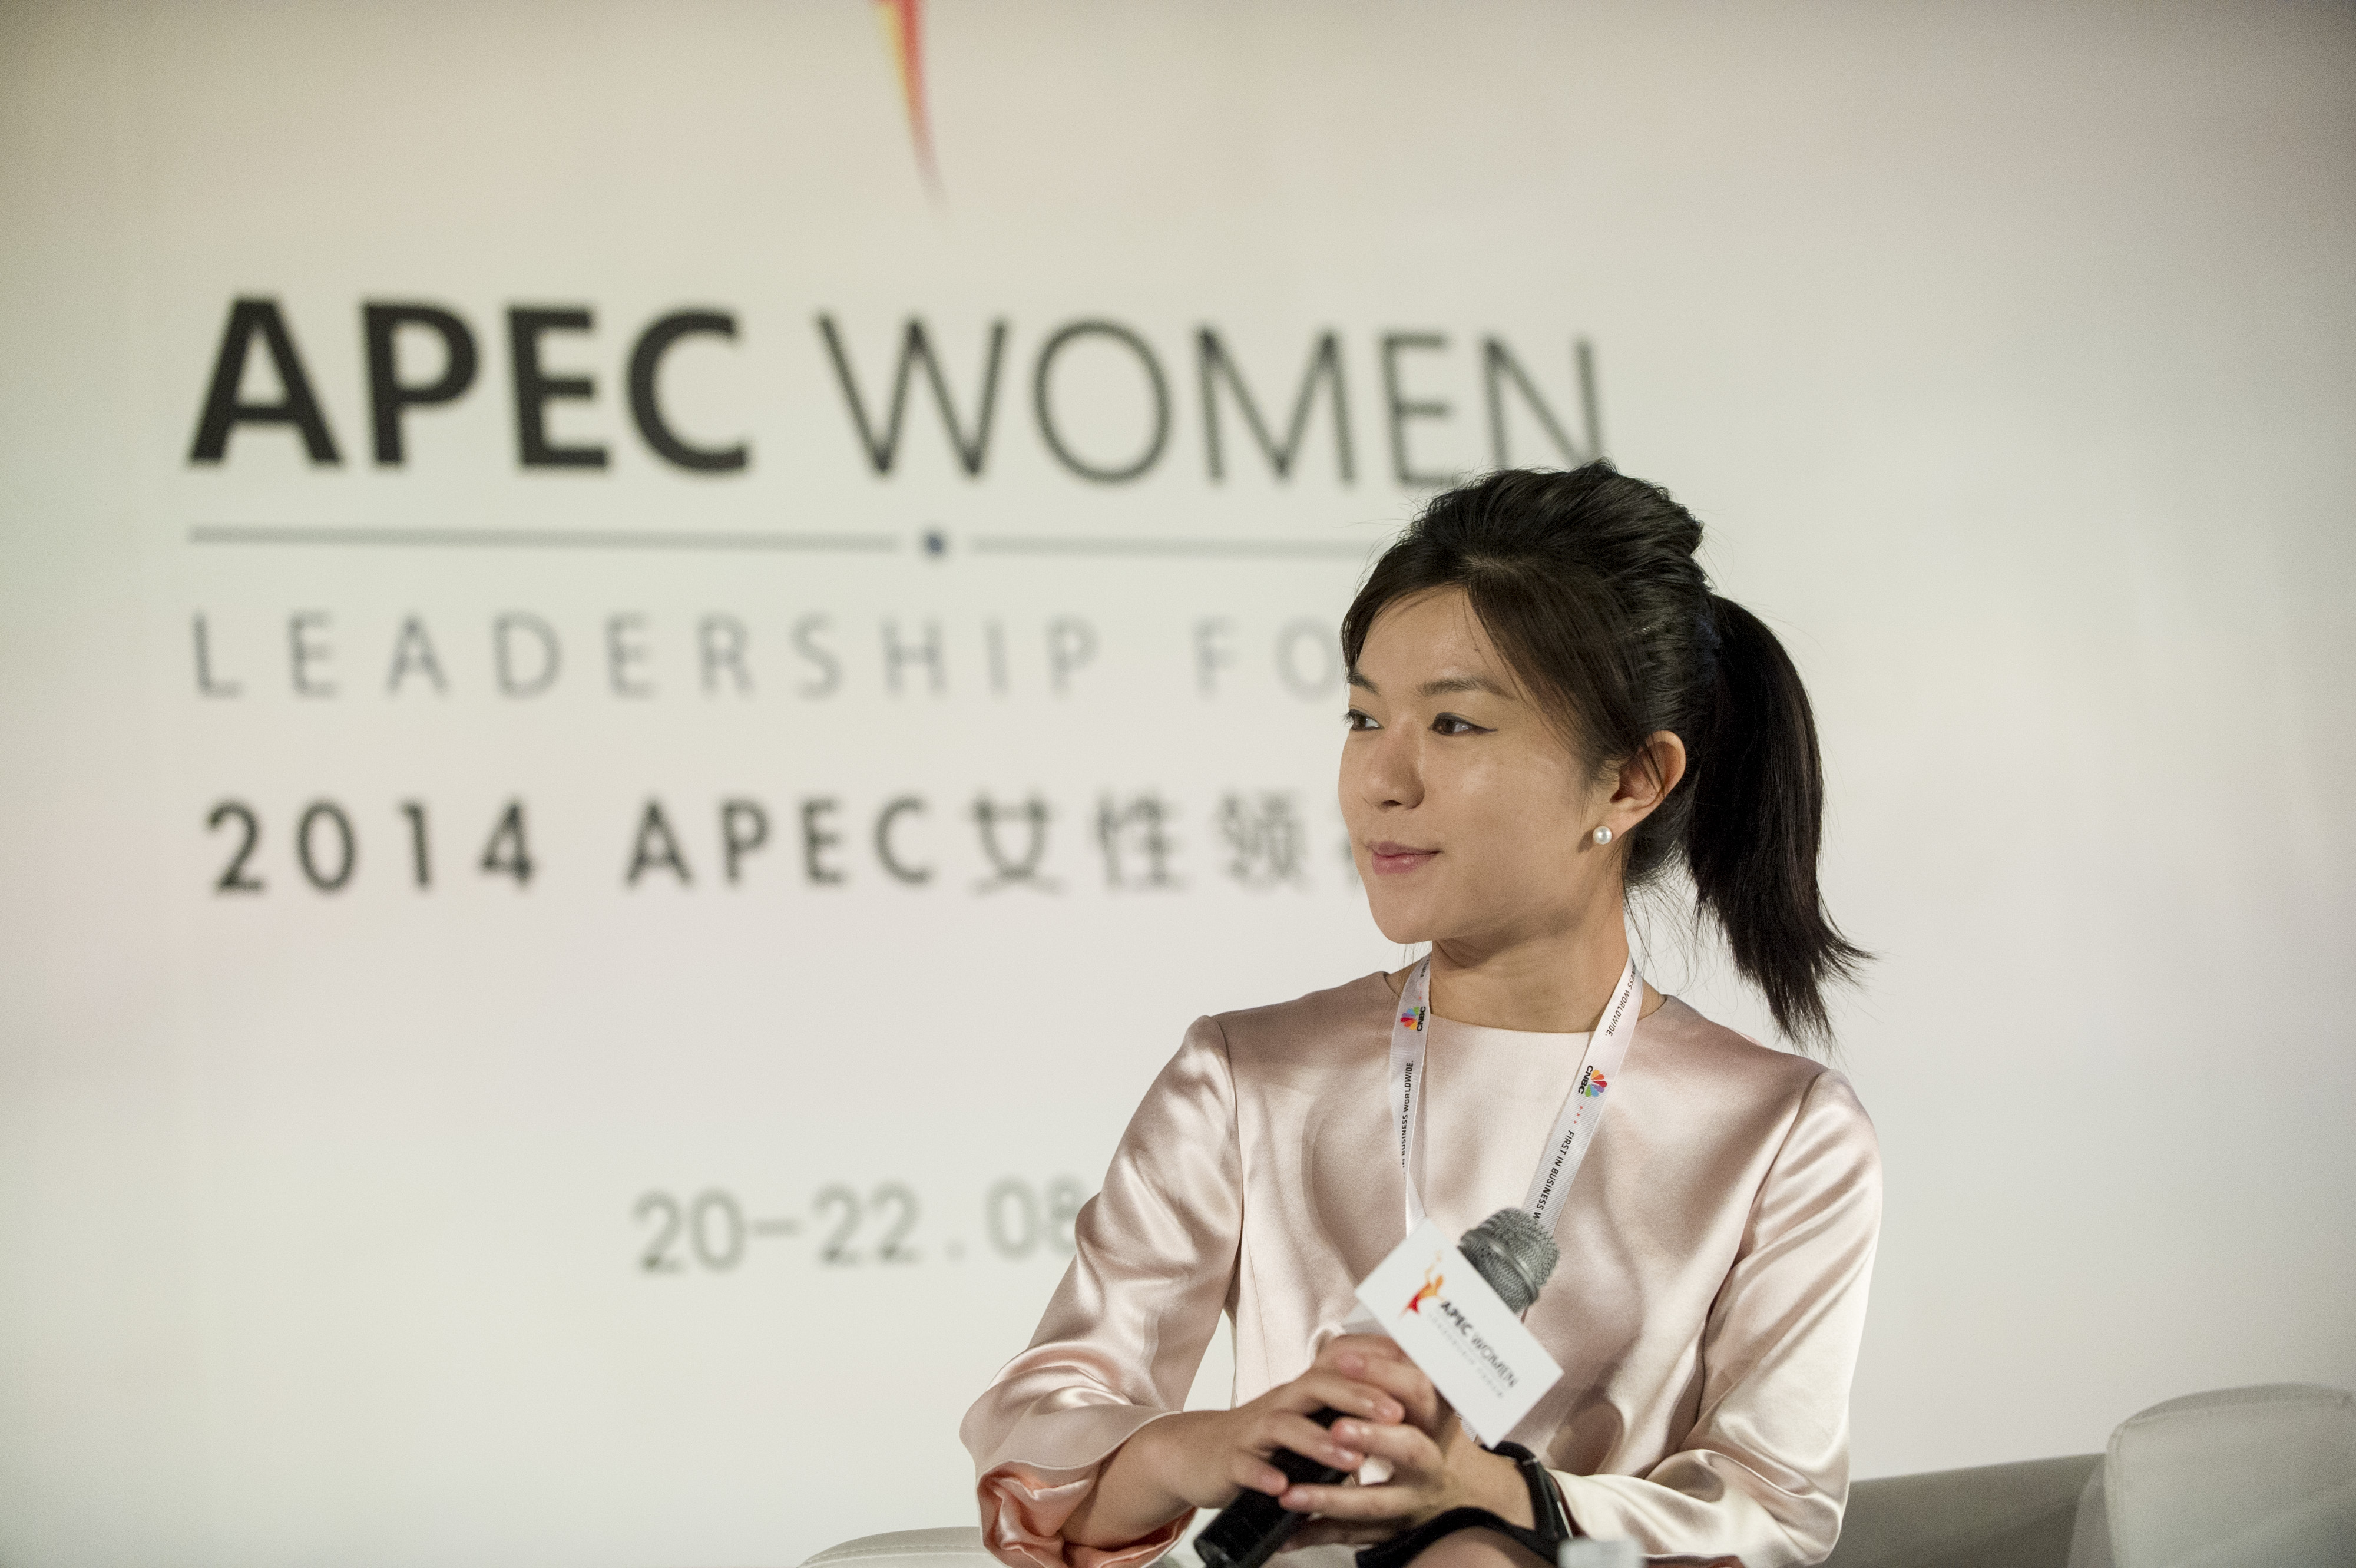 Ms. Kathy Gong, Chairwomen